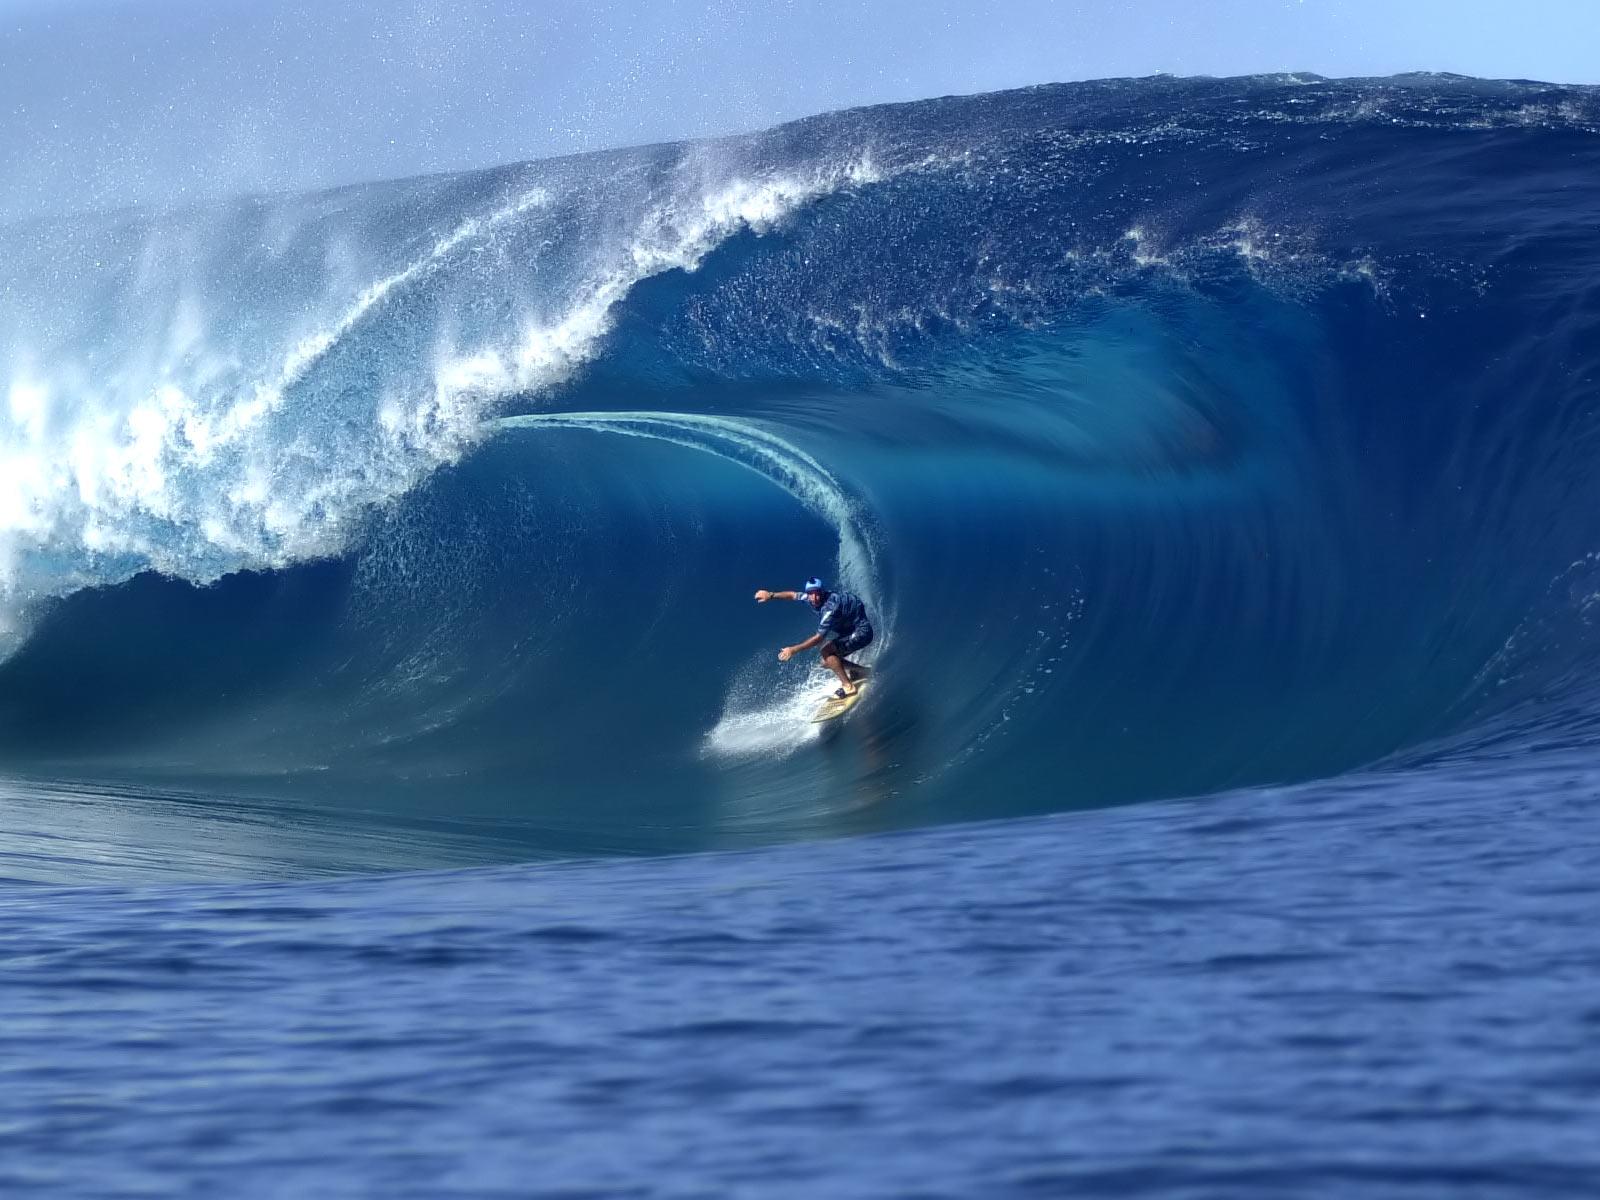 http://1.bp.blogspot.com/-O86ImjBqiXI/TpDMYNe2PKI/AAAAAAAADAw/TPv_V-jxv0g/s1600/surfing_3.jpg